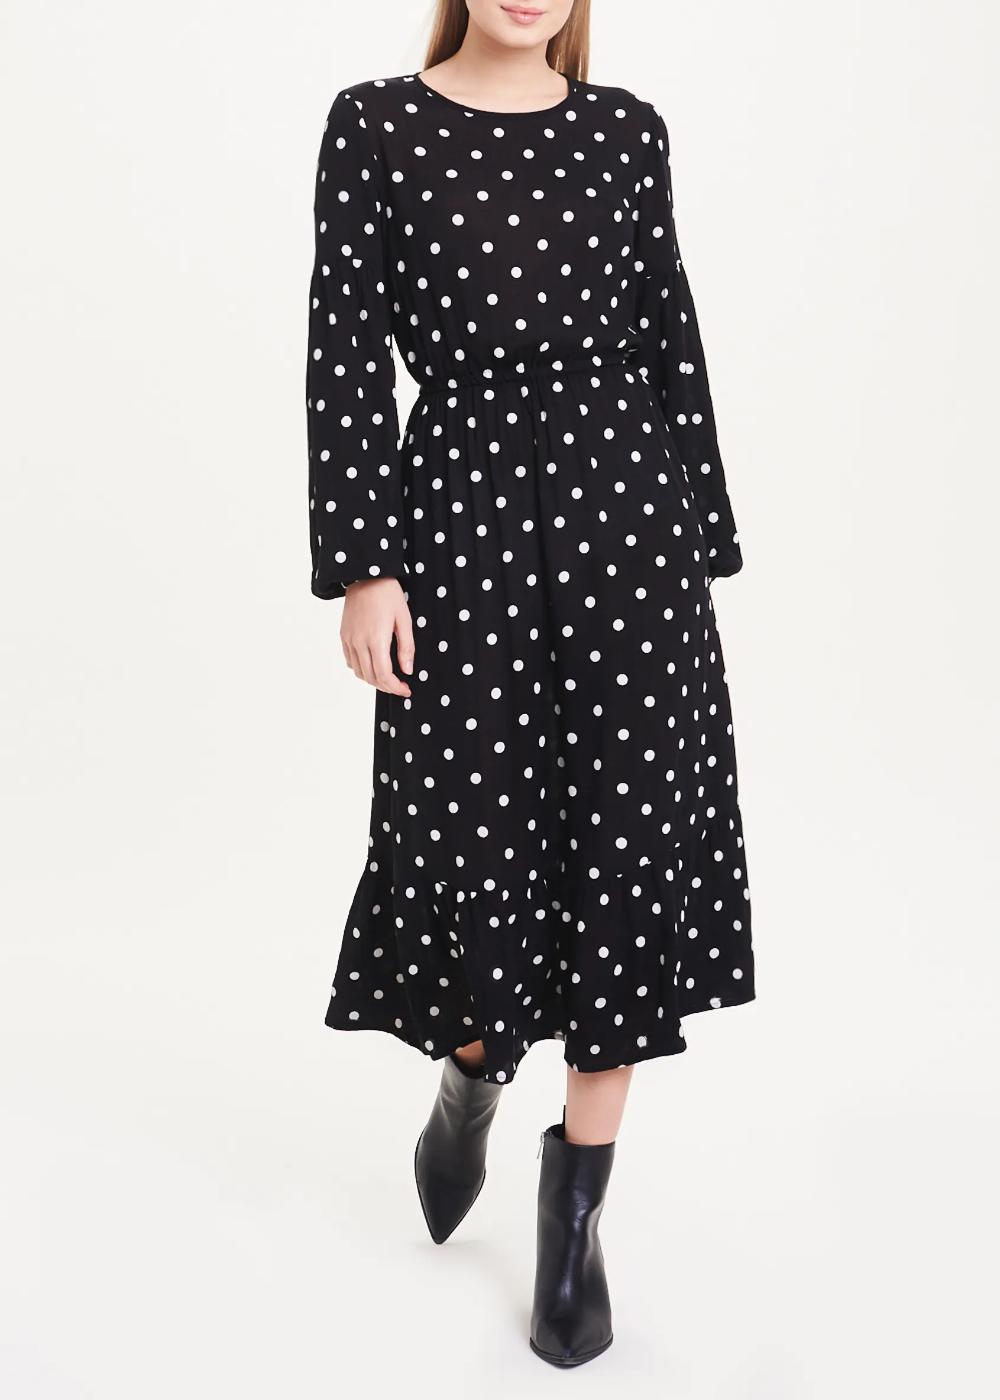 Black Long Sleeve Polka Dot Midi Dress Black Midi Dress Dresses Black Midi Dress [ 1400 x 1000 Pixel ]